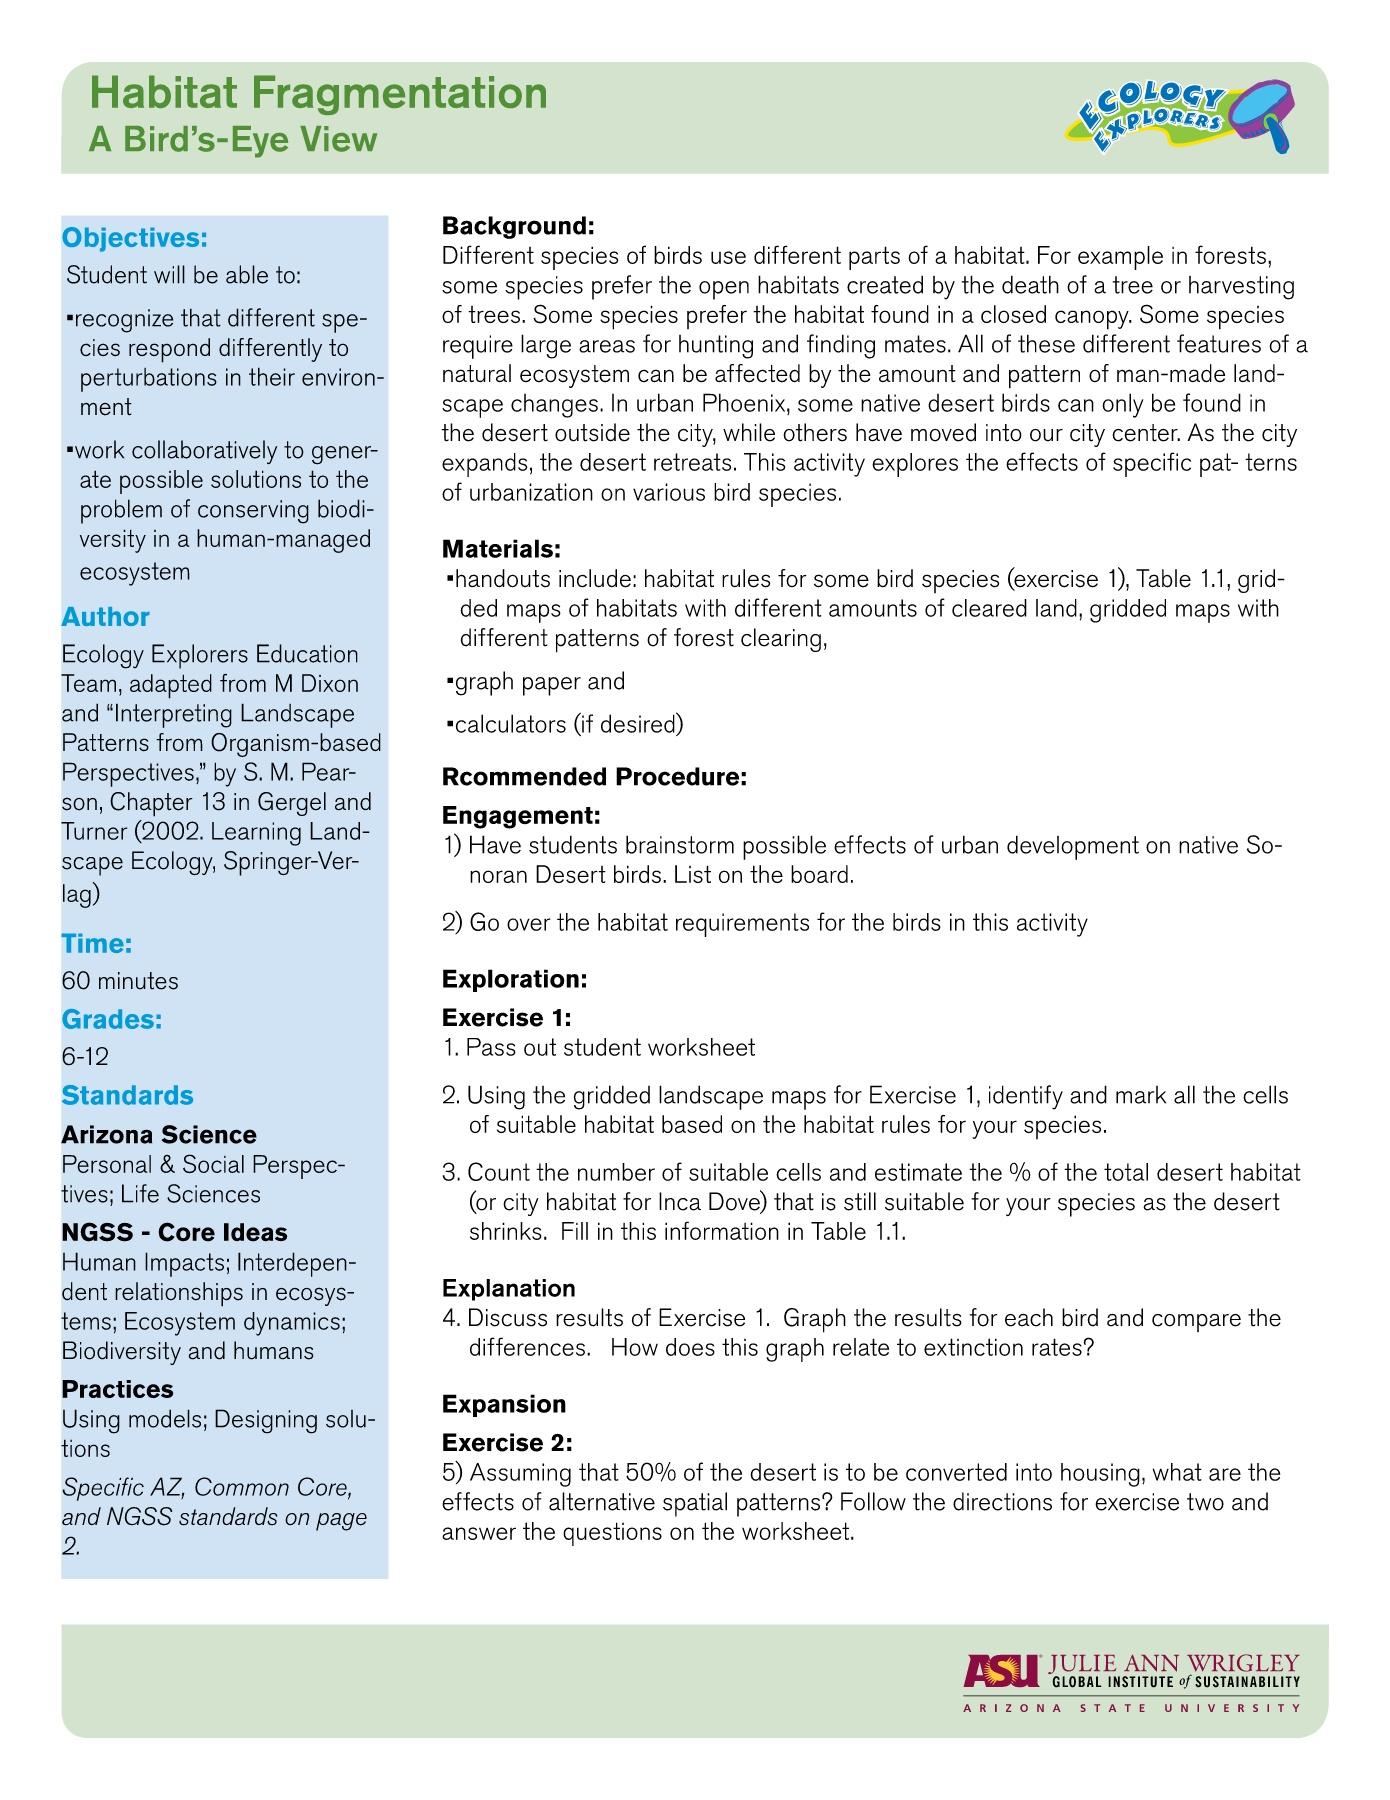 small resolution of Habitat-Fragmentation-A-Birds-Eye-View-Flip eBook Pages 1 - 7  AnyFlip    AnyFlip